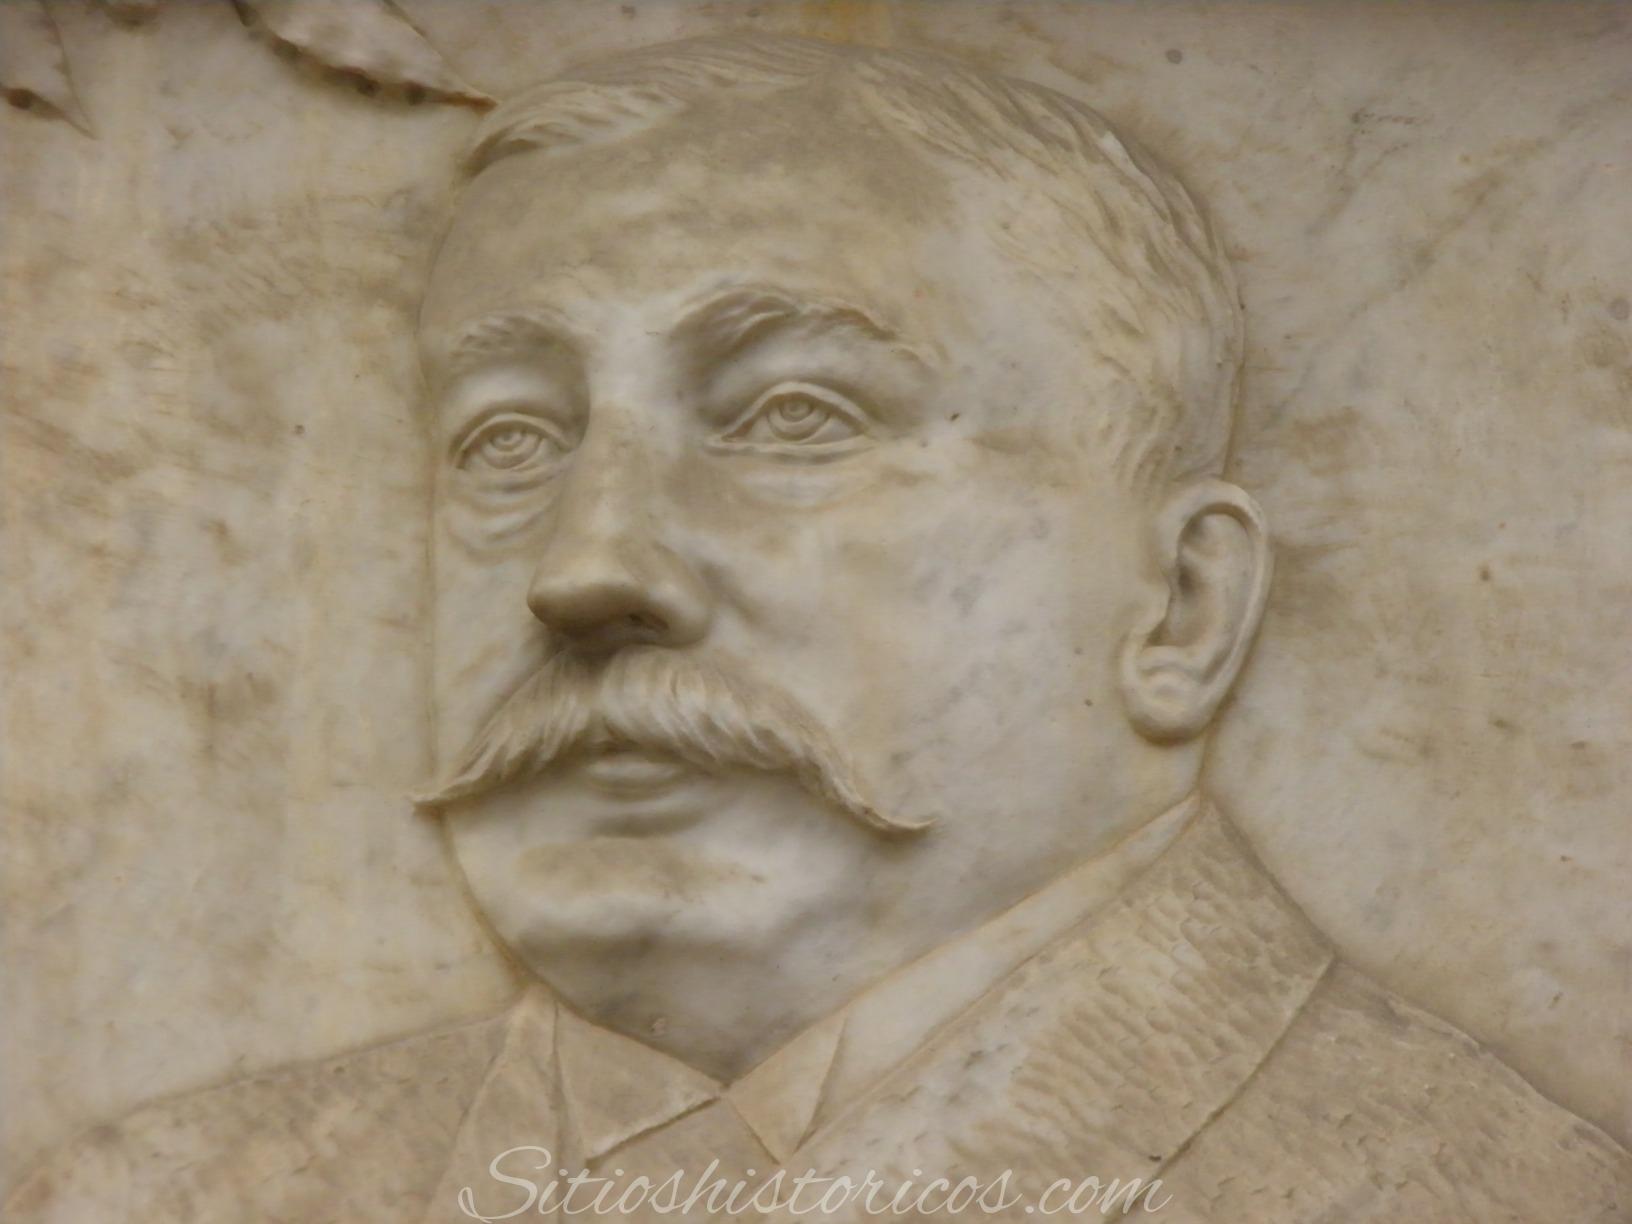 José Arana Elorza